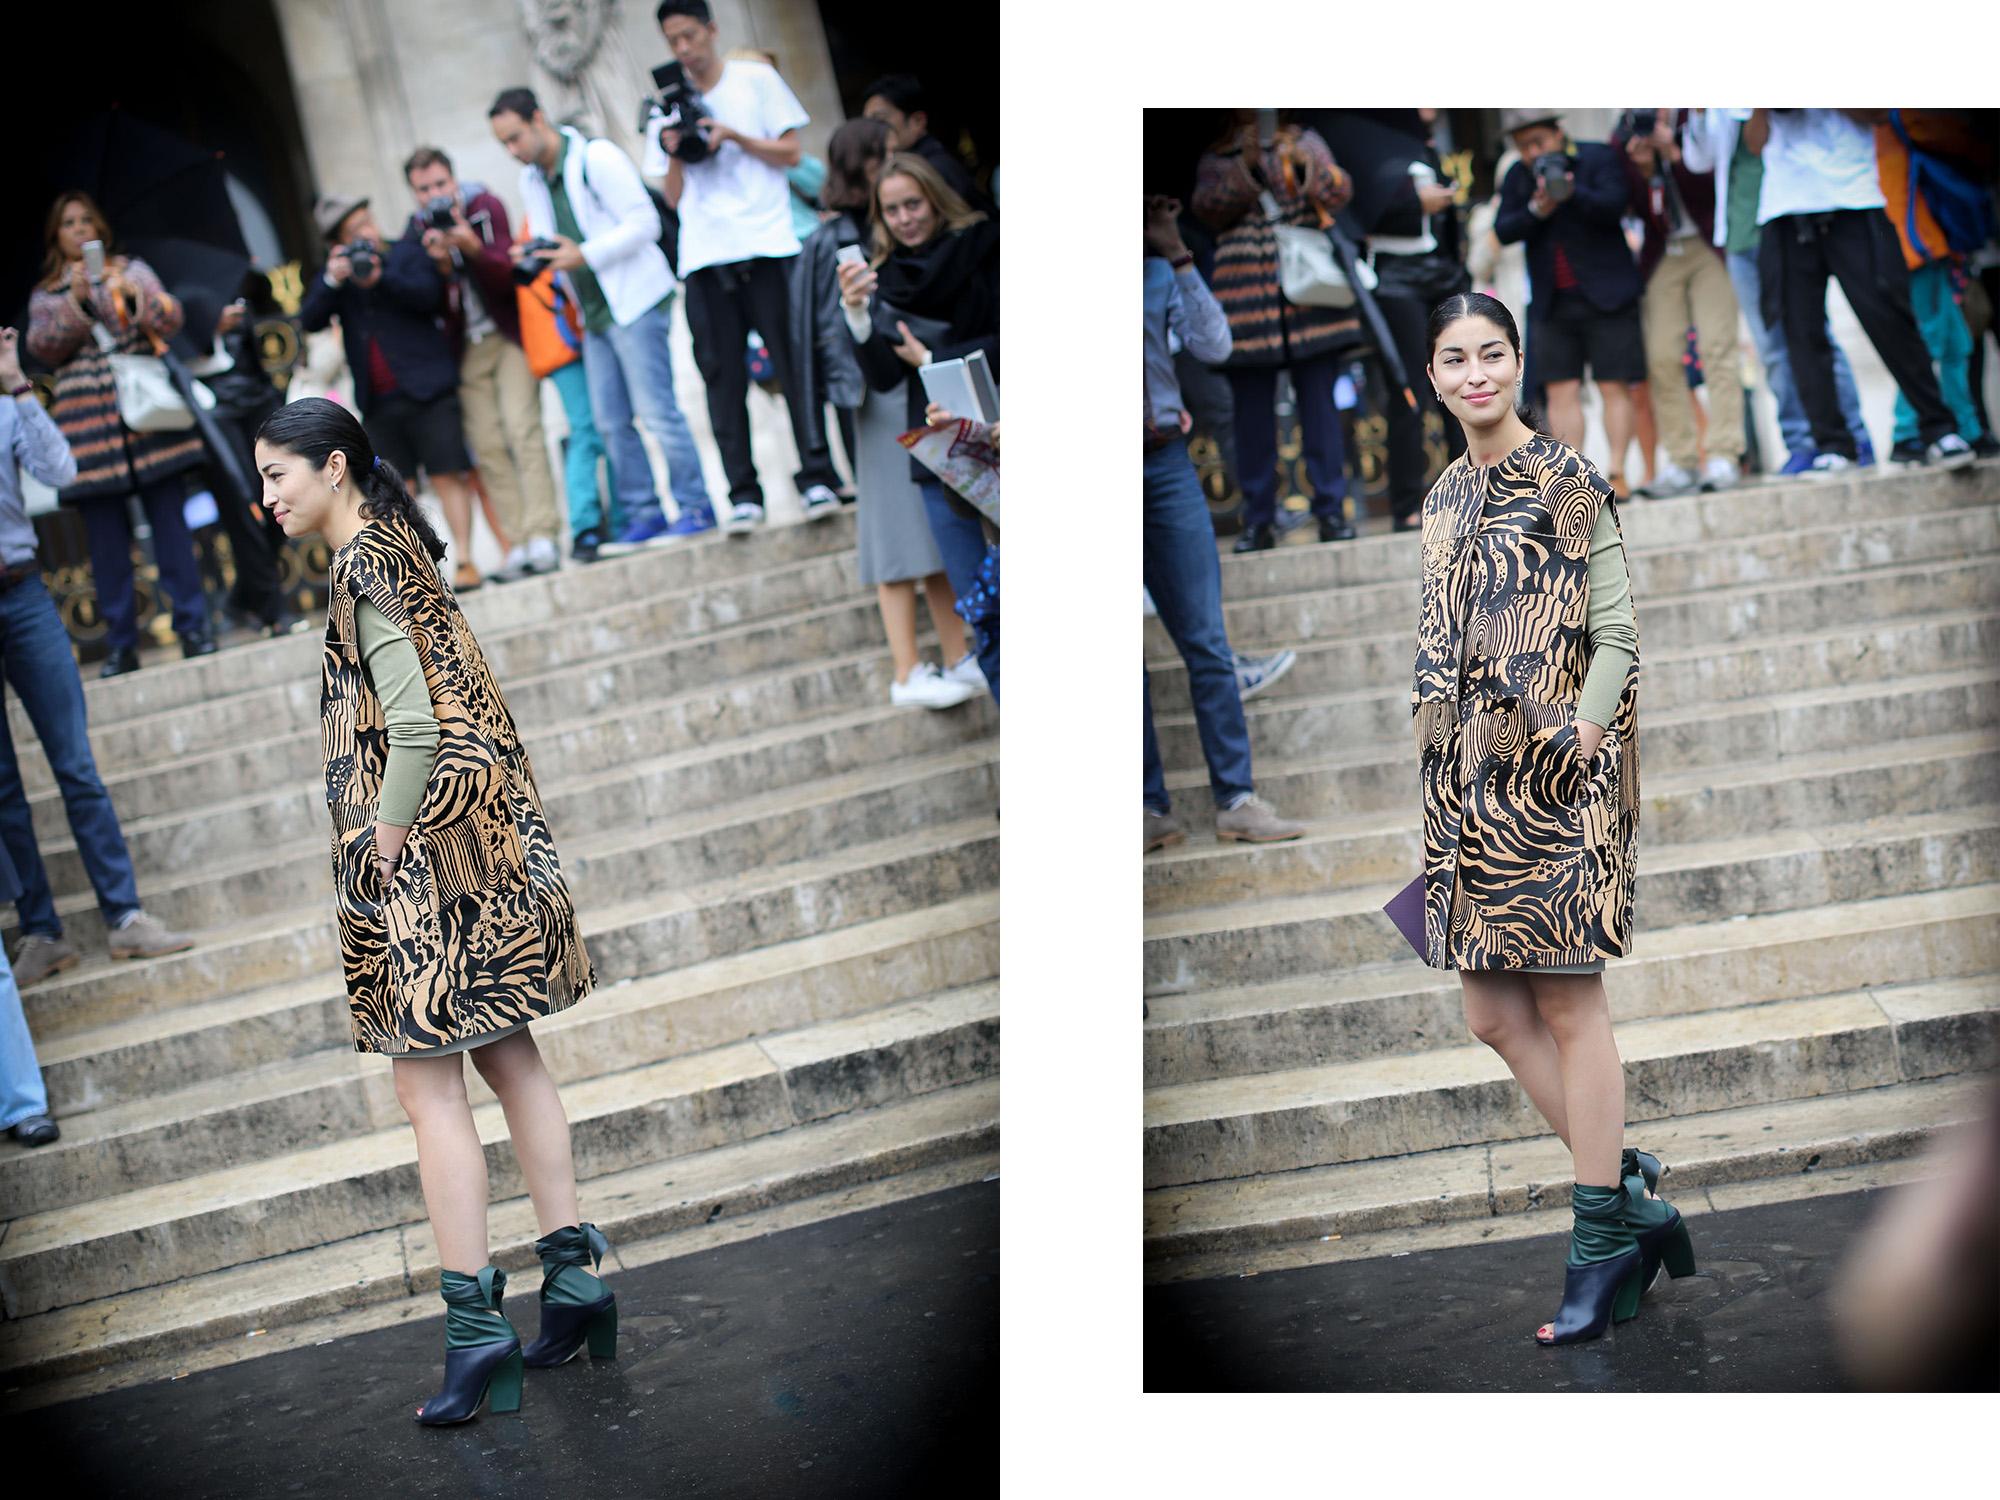 Clochet-streetstyle-caroline-issa-paris-fashion-week-7